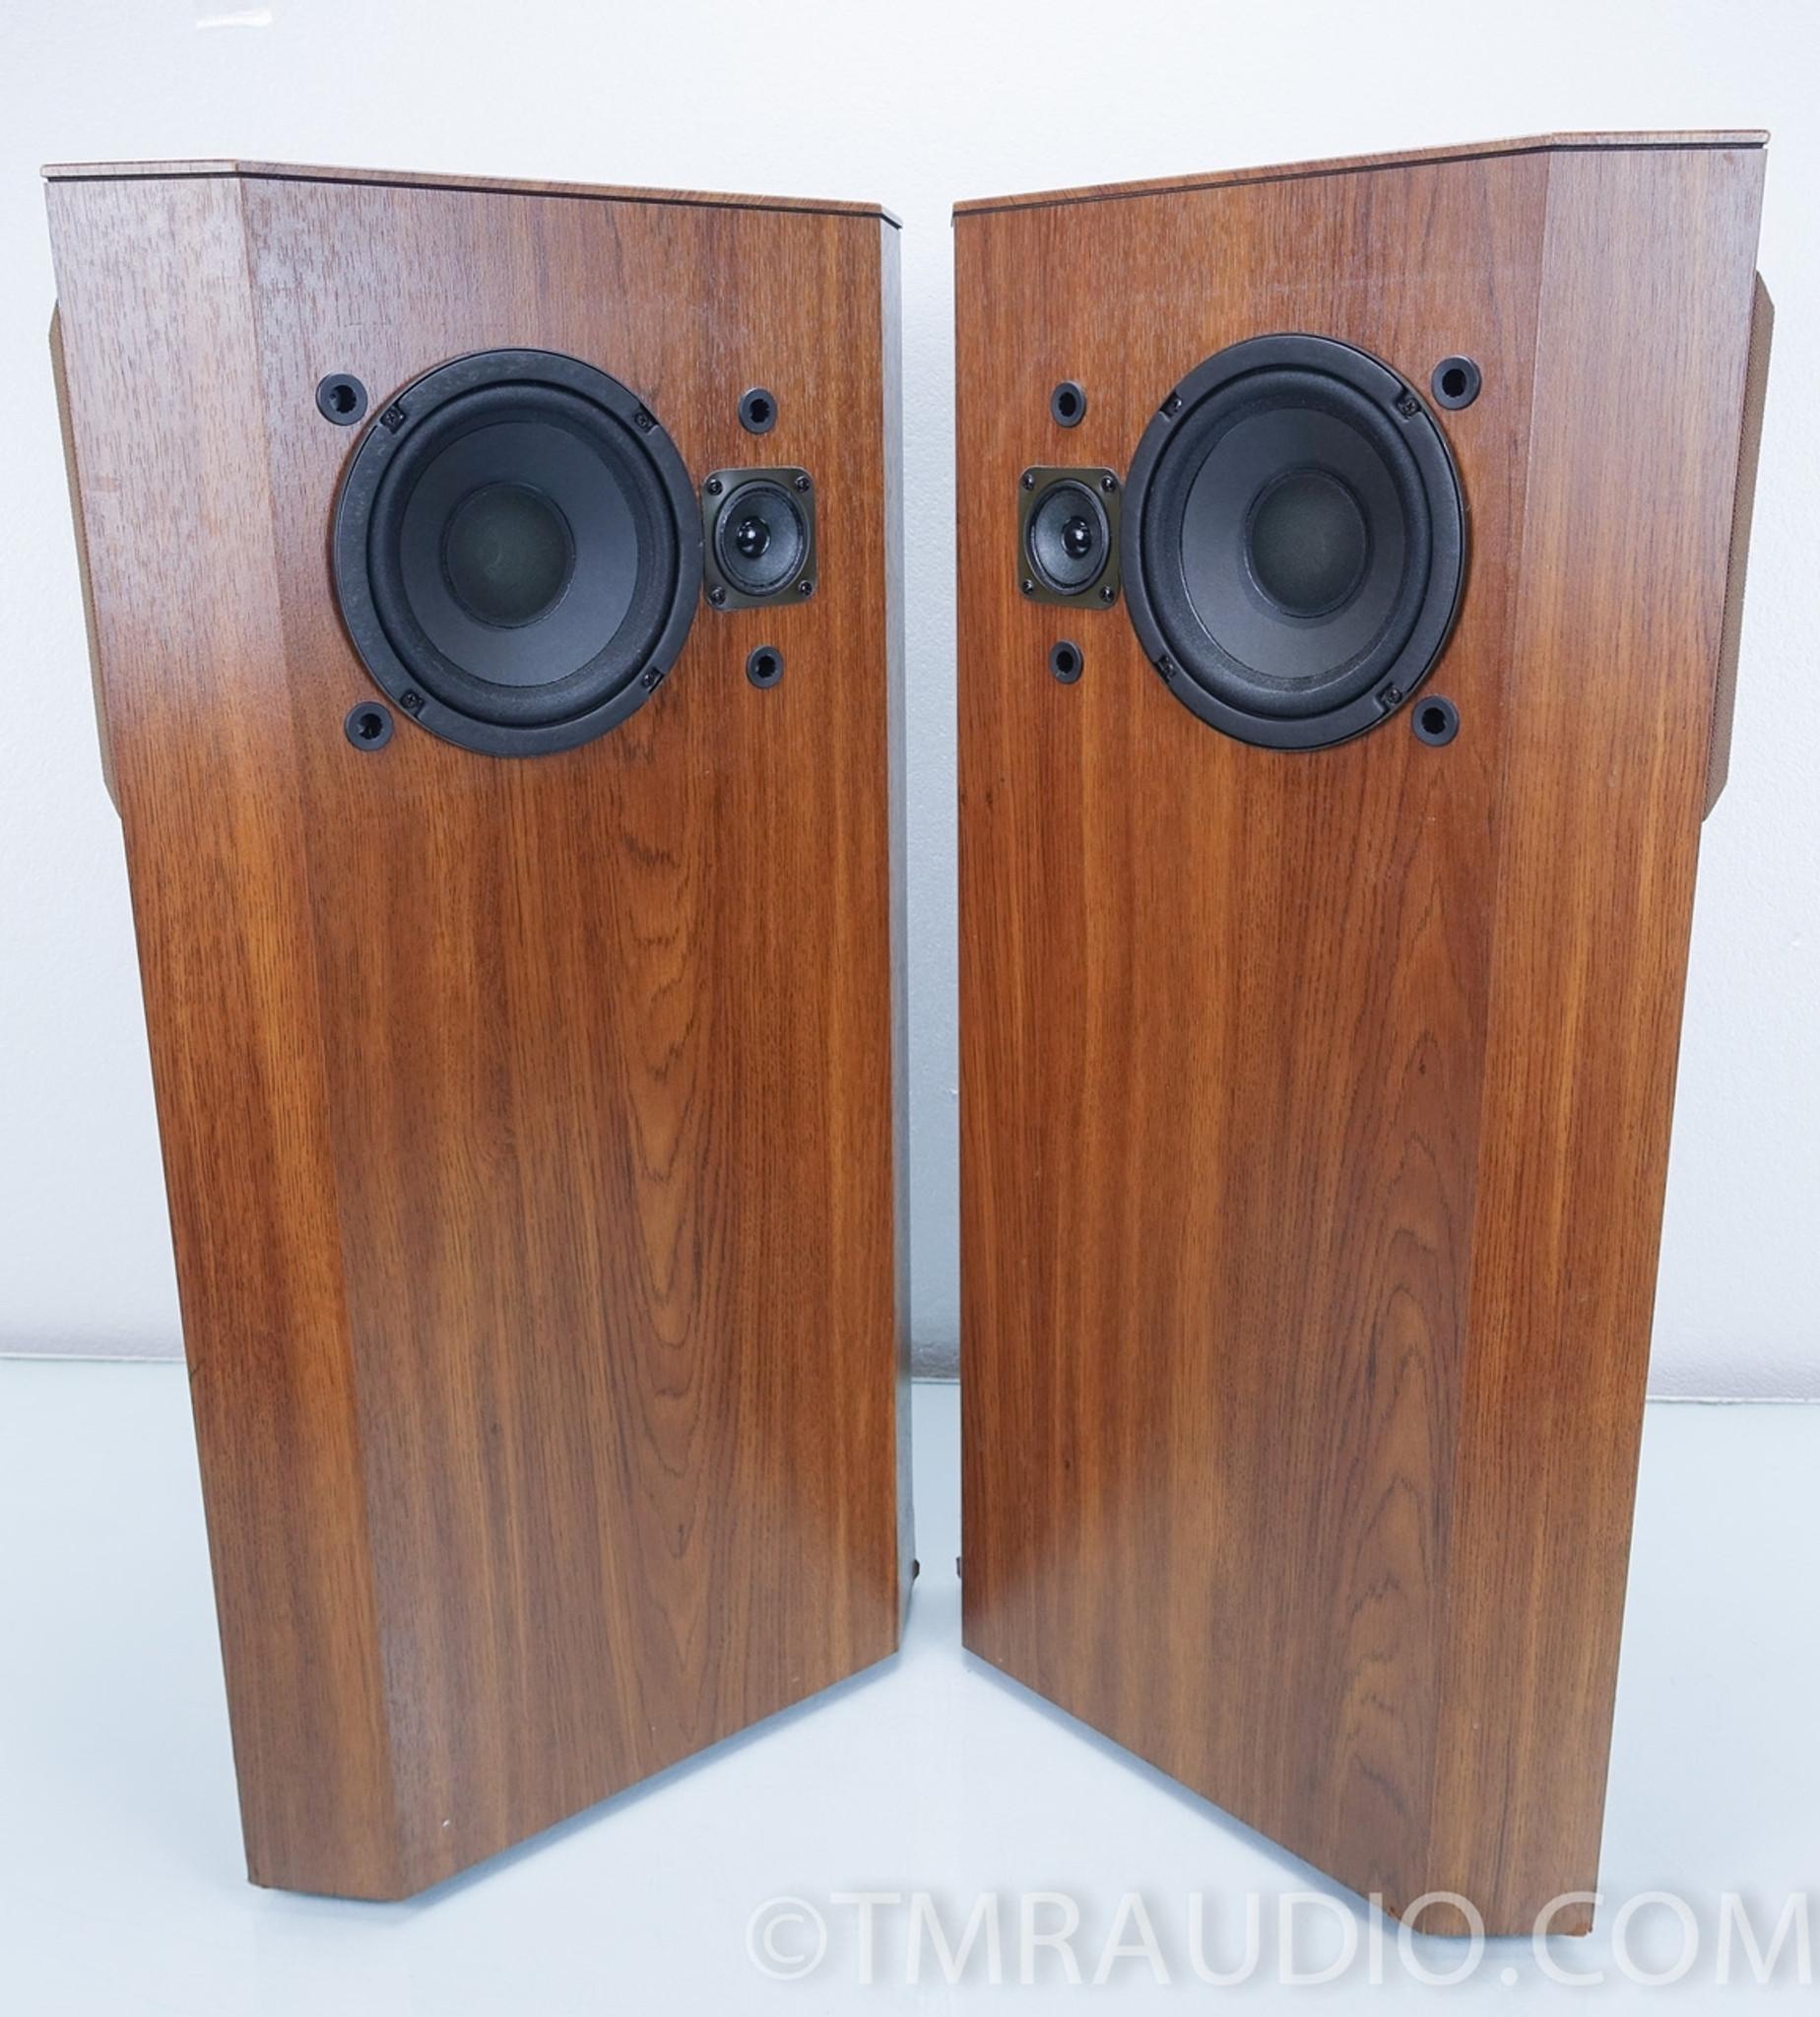 Bose 401 Floorstanding Speakers Excellent Working Pair